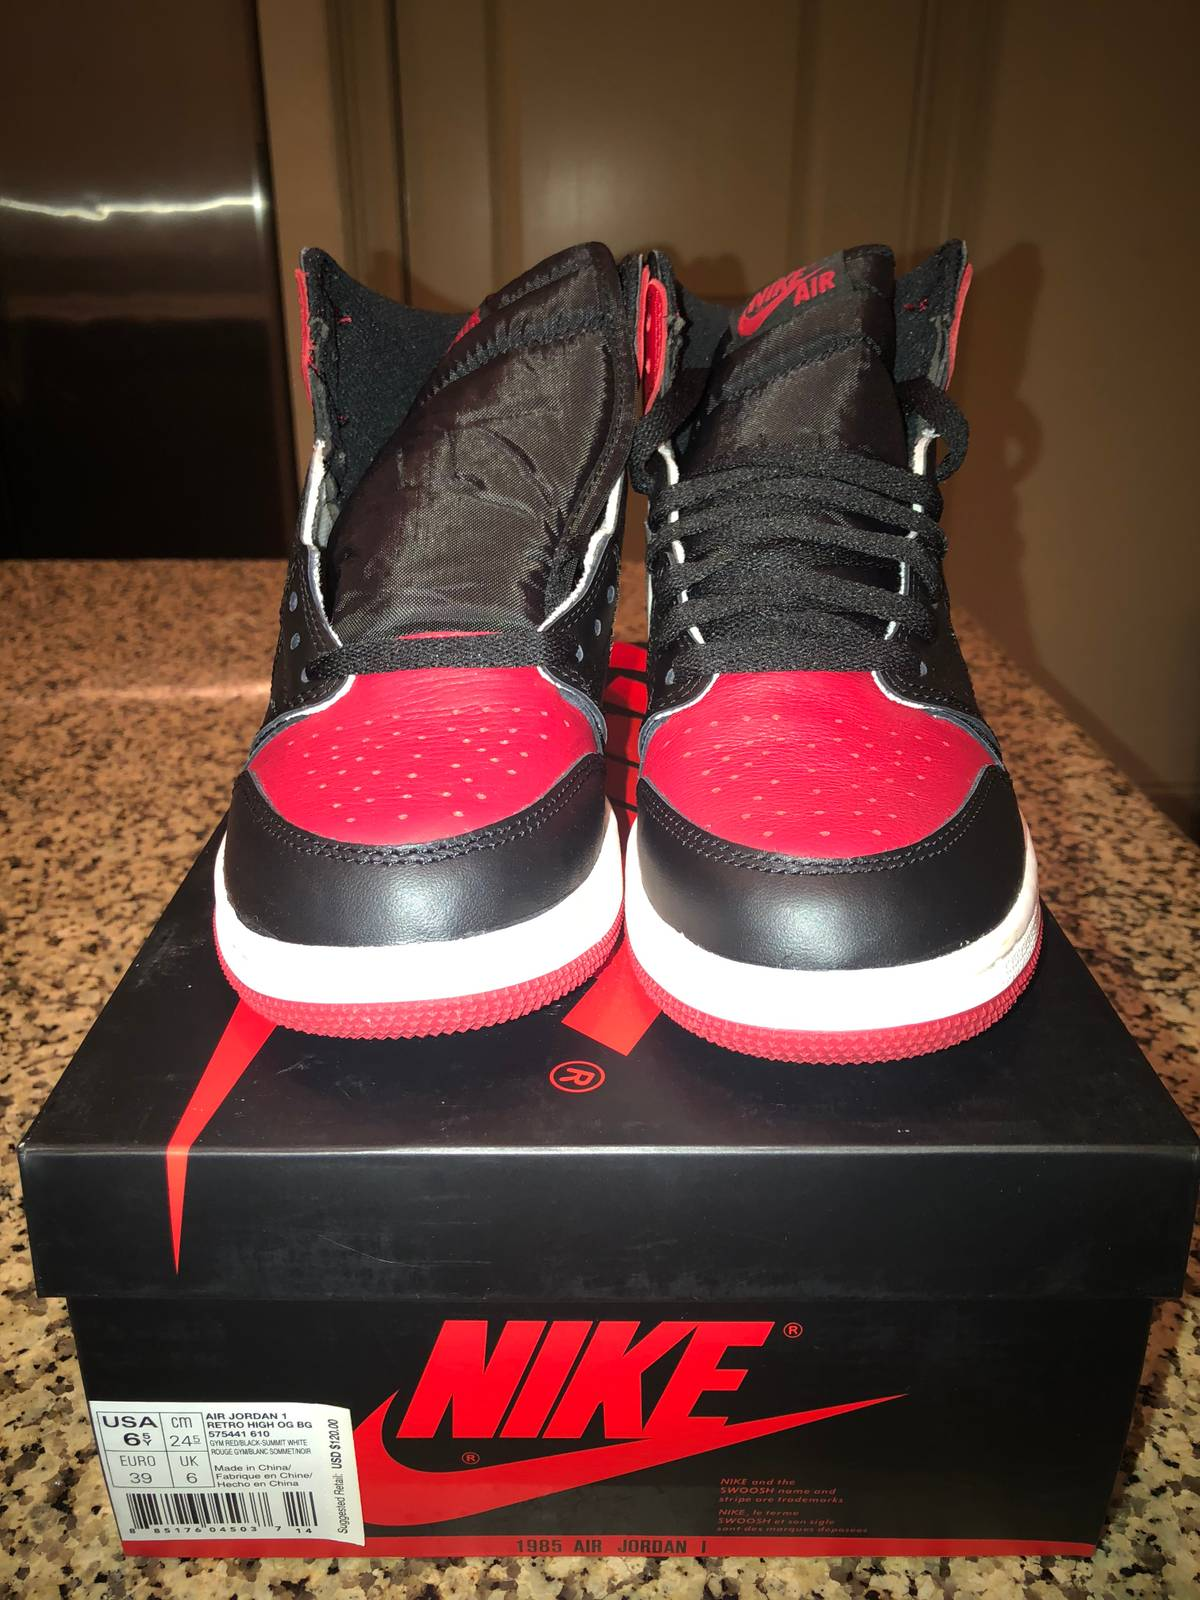 hot sale online 1b95a 5fcb5 Jordan Brand. Air Jordan 1 High OG Bred Toe 555088-610